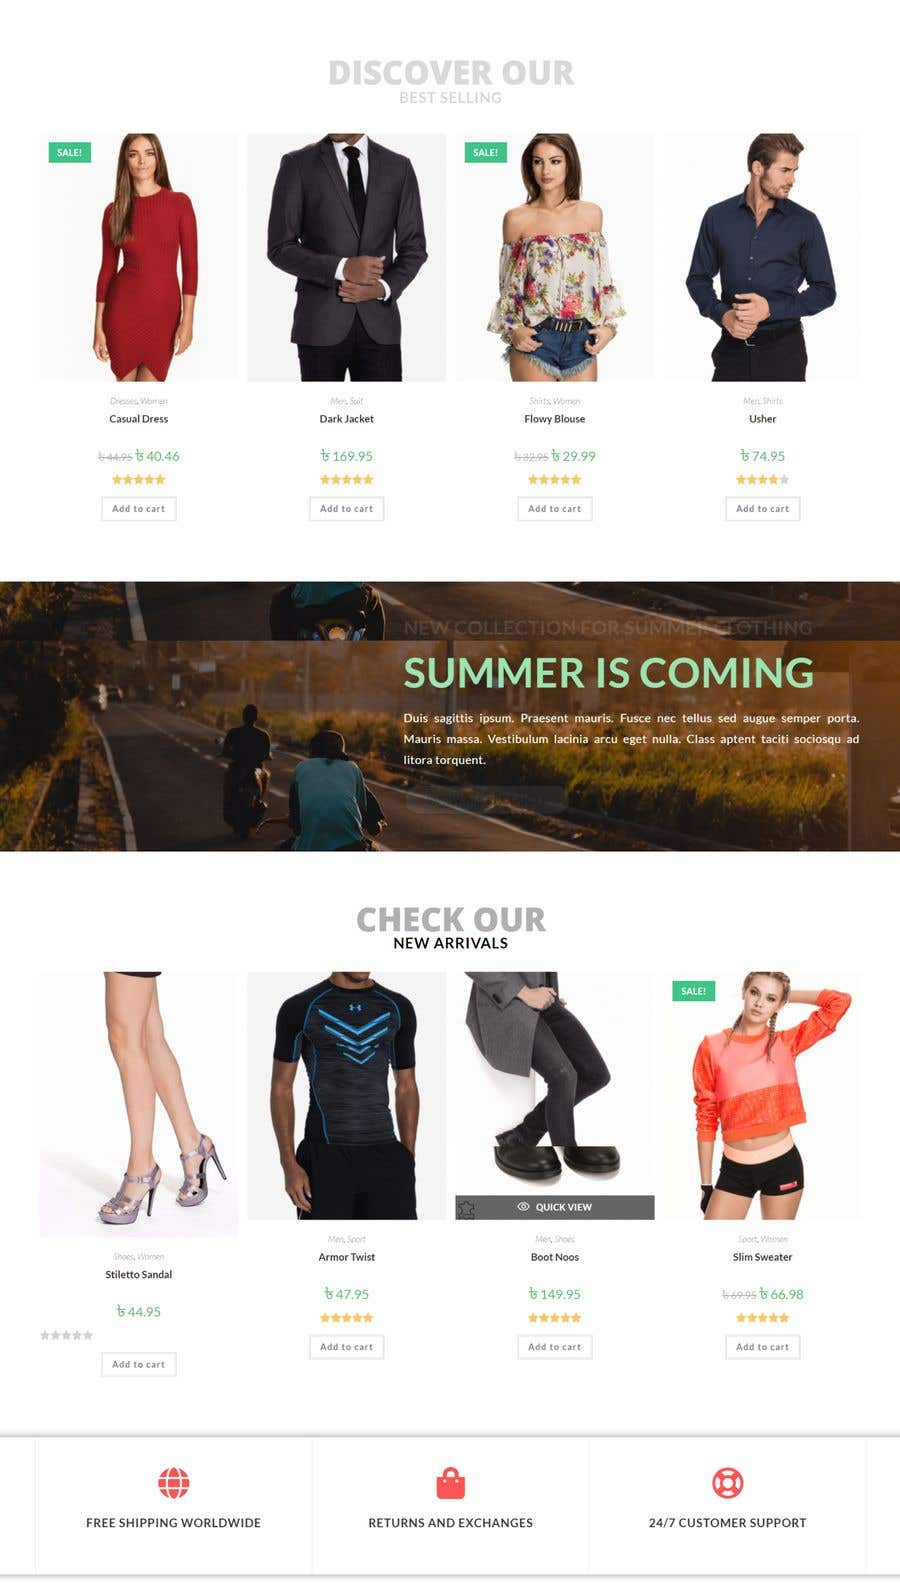 Konkurrenceindlæg #                                        3                                      for                                         Design an online shopping page for my website